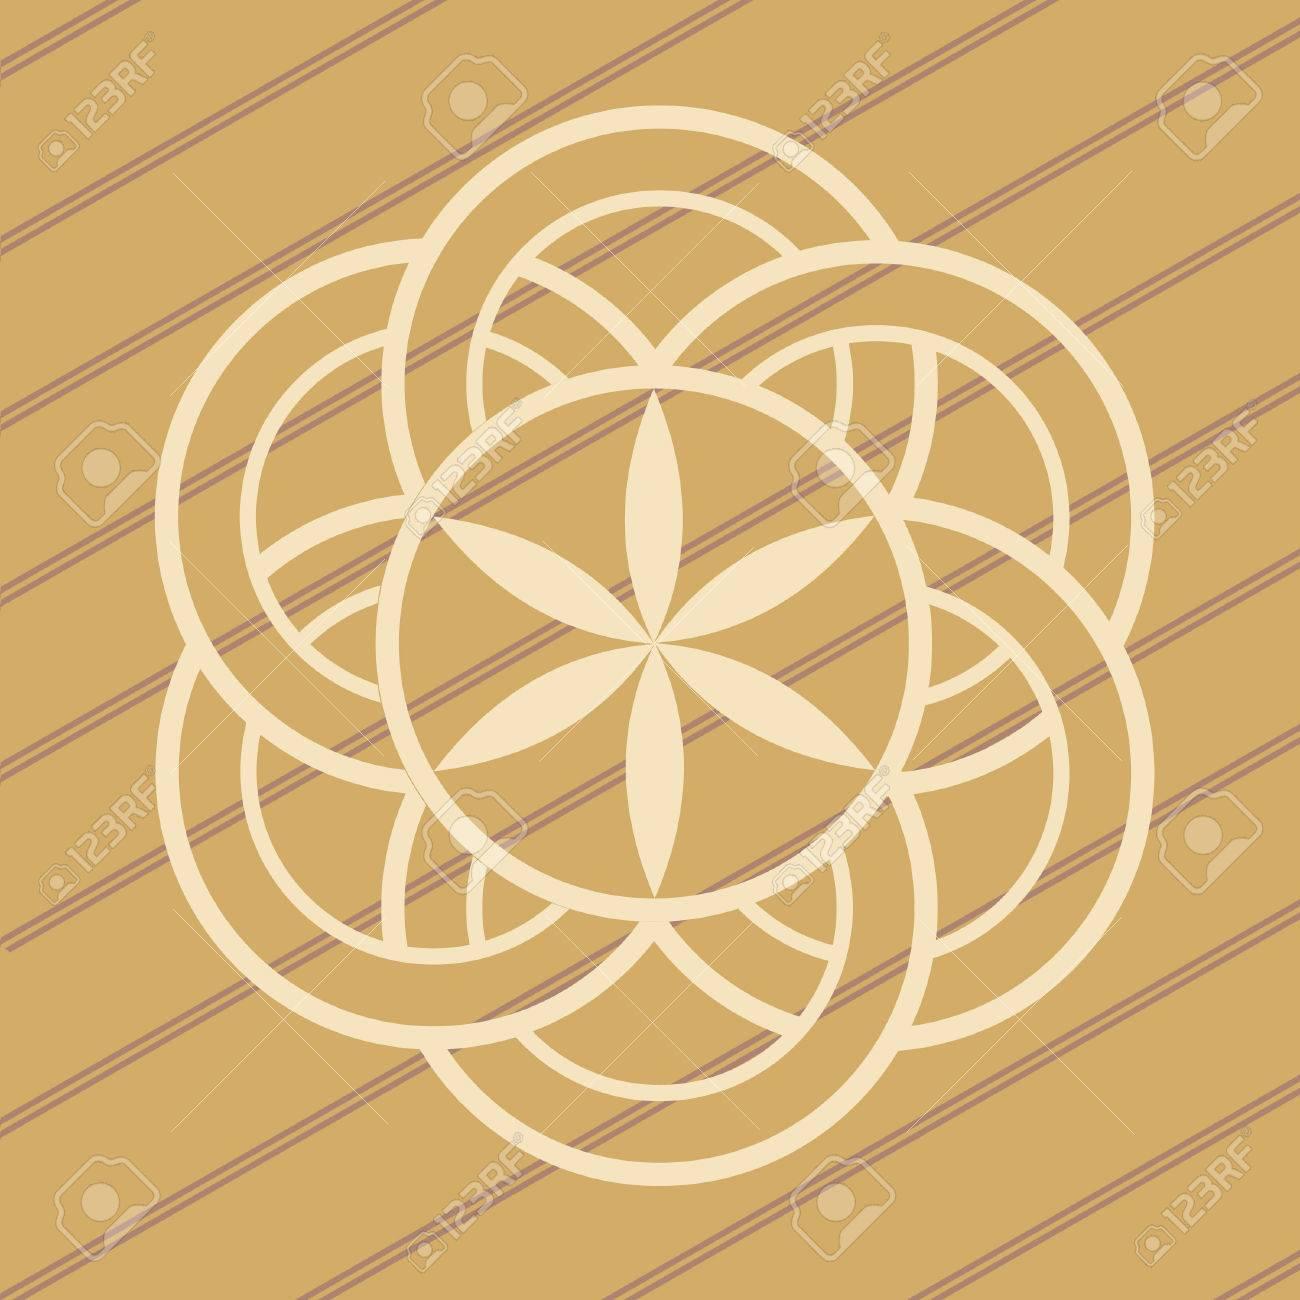 ufo crop circles design in wheat/corn fields Stock Vector - 9845816